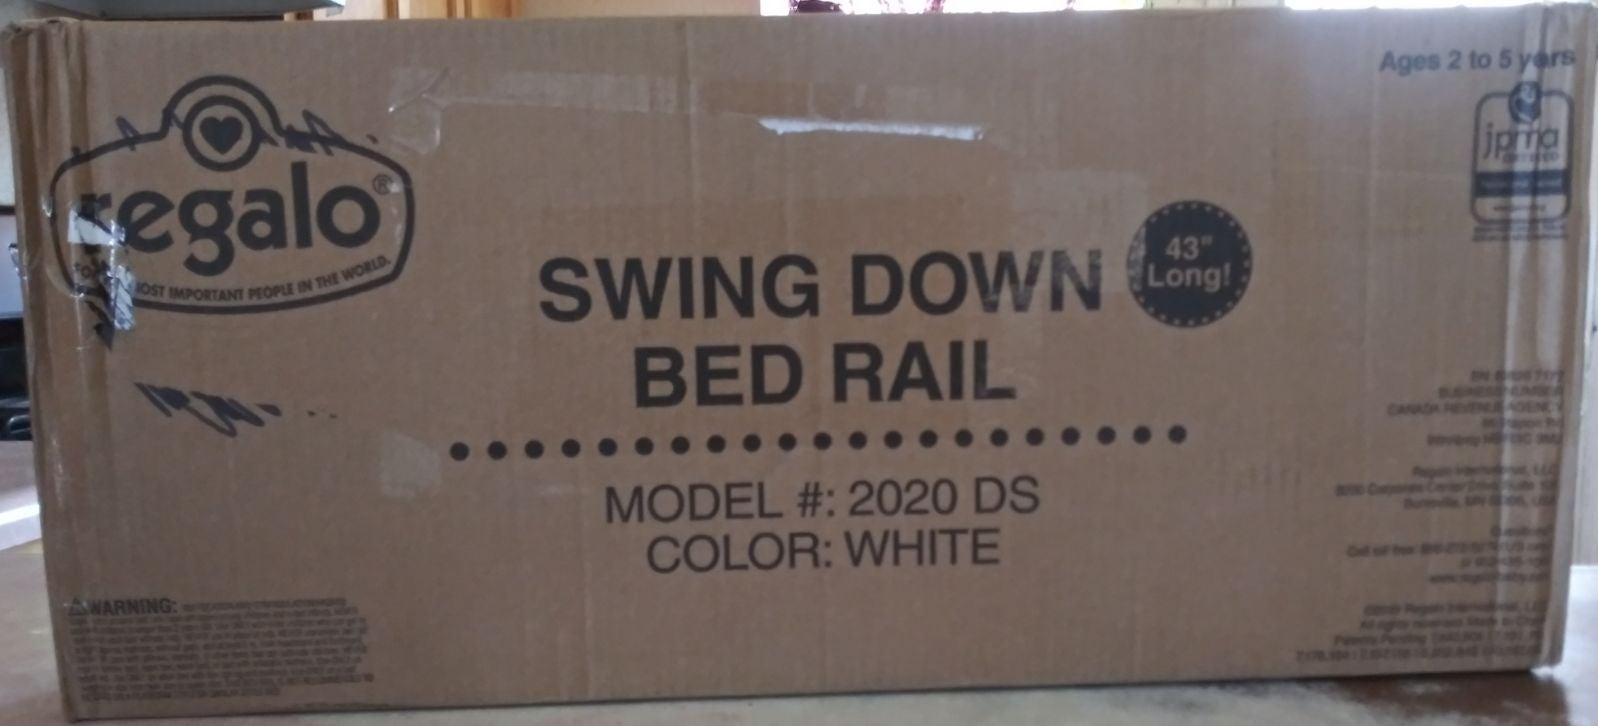 """REGALO"" BED RAIL"